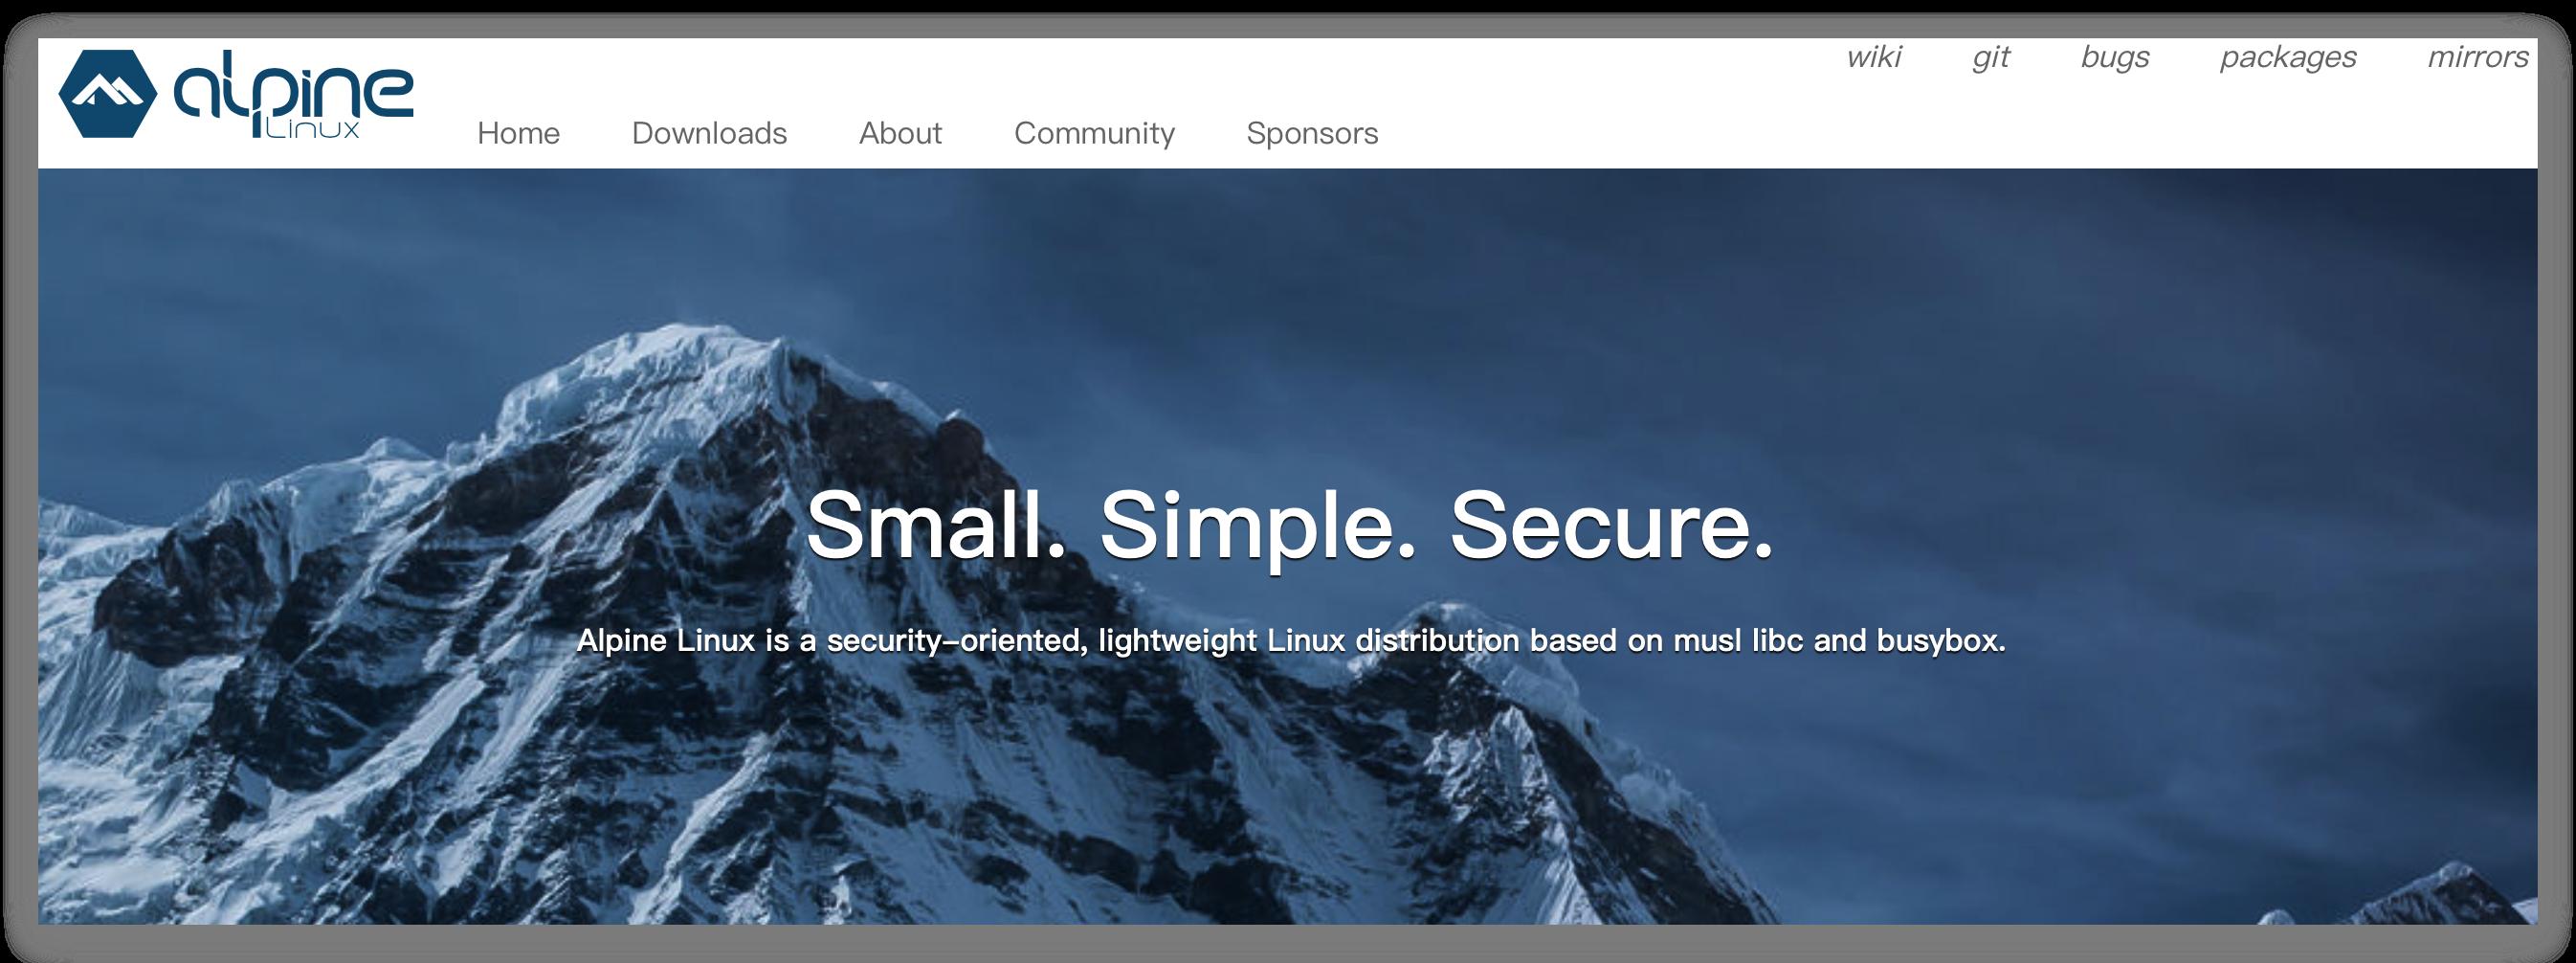 《Alpine下载软件时指定软件源》